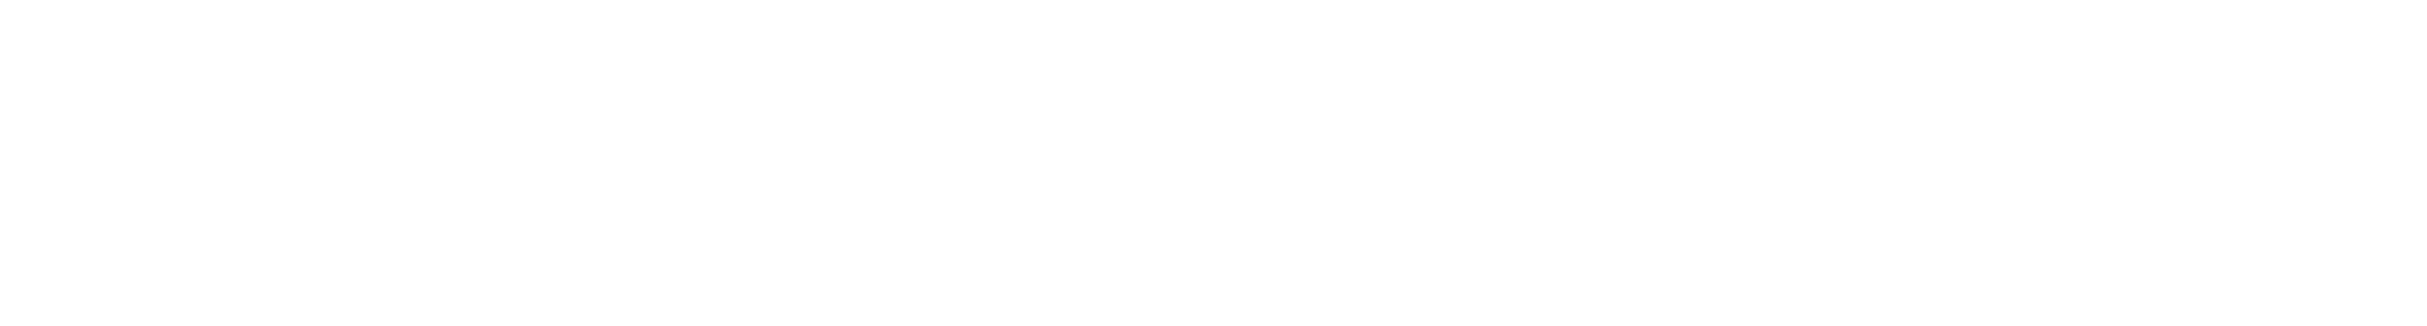 RobsonForensic_logo white-1